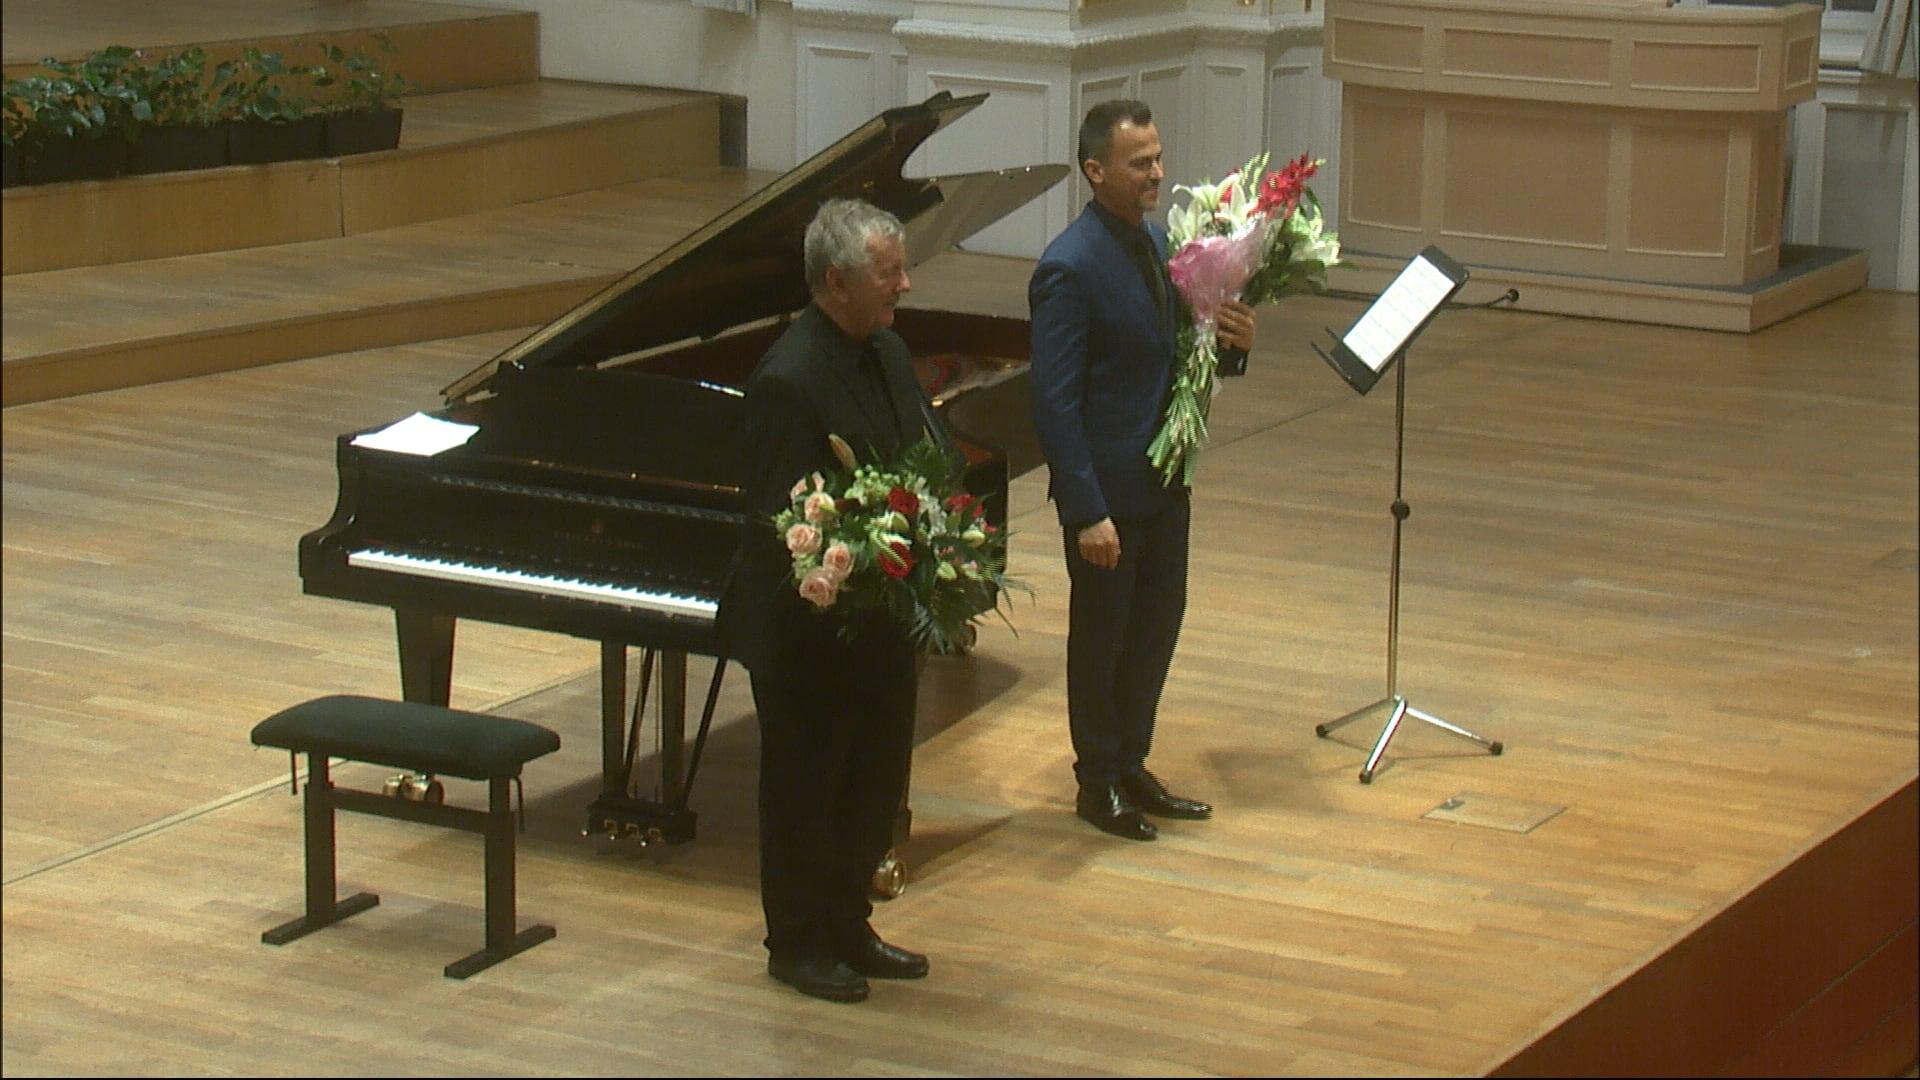 Koncert s publikom IV – Kocán / Lapšanský